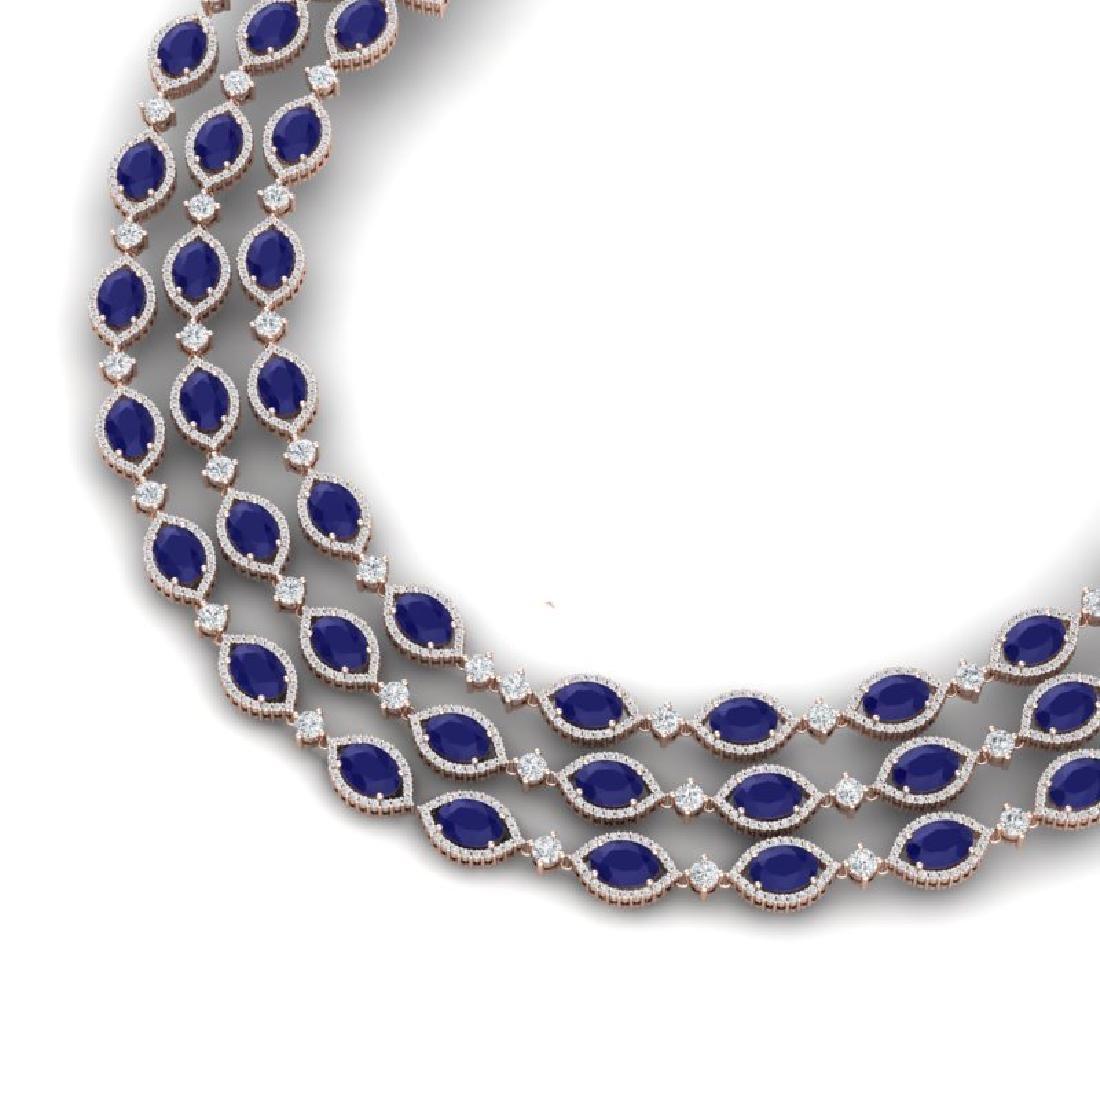 85.81 CTW Royalty Sapphire & VS Diamond Necklace 18K